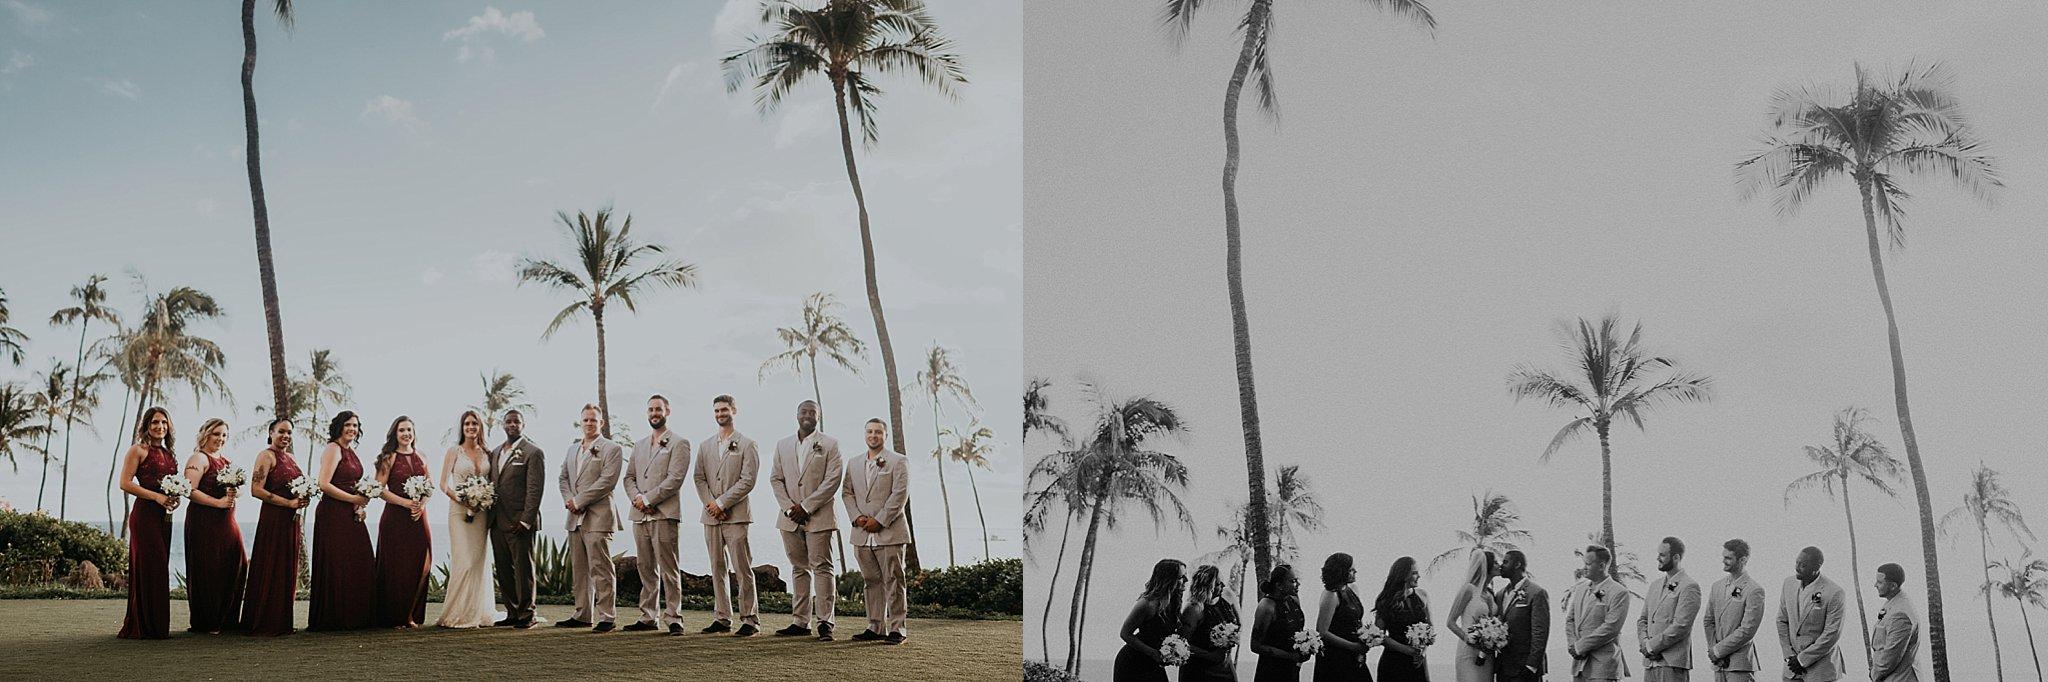 samantha_mcfarlen_bellingham_washington_engagement_photography_seattle_wedding_photographer_0225.jpg